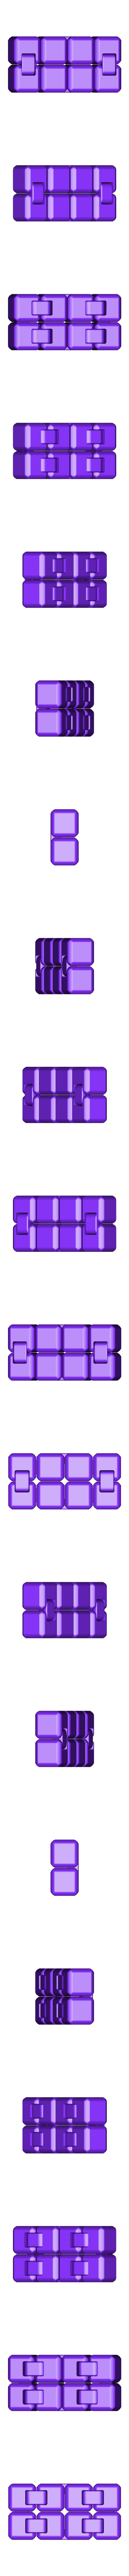 Fidget_Cube_blockGap0.20_hingeGap0.3.stl Download free STL file Fidget Cube Remix • Object to 3D print, WalterHsiao